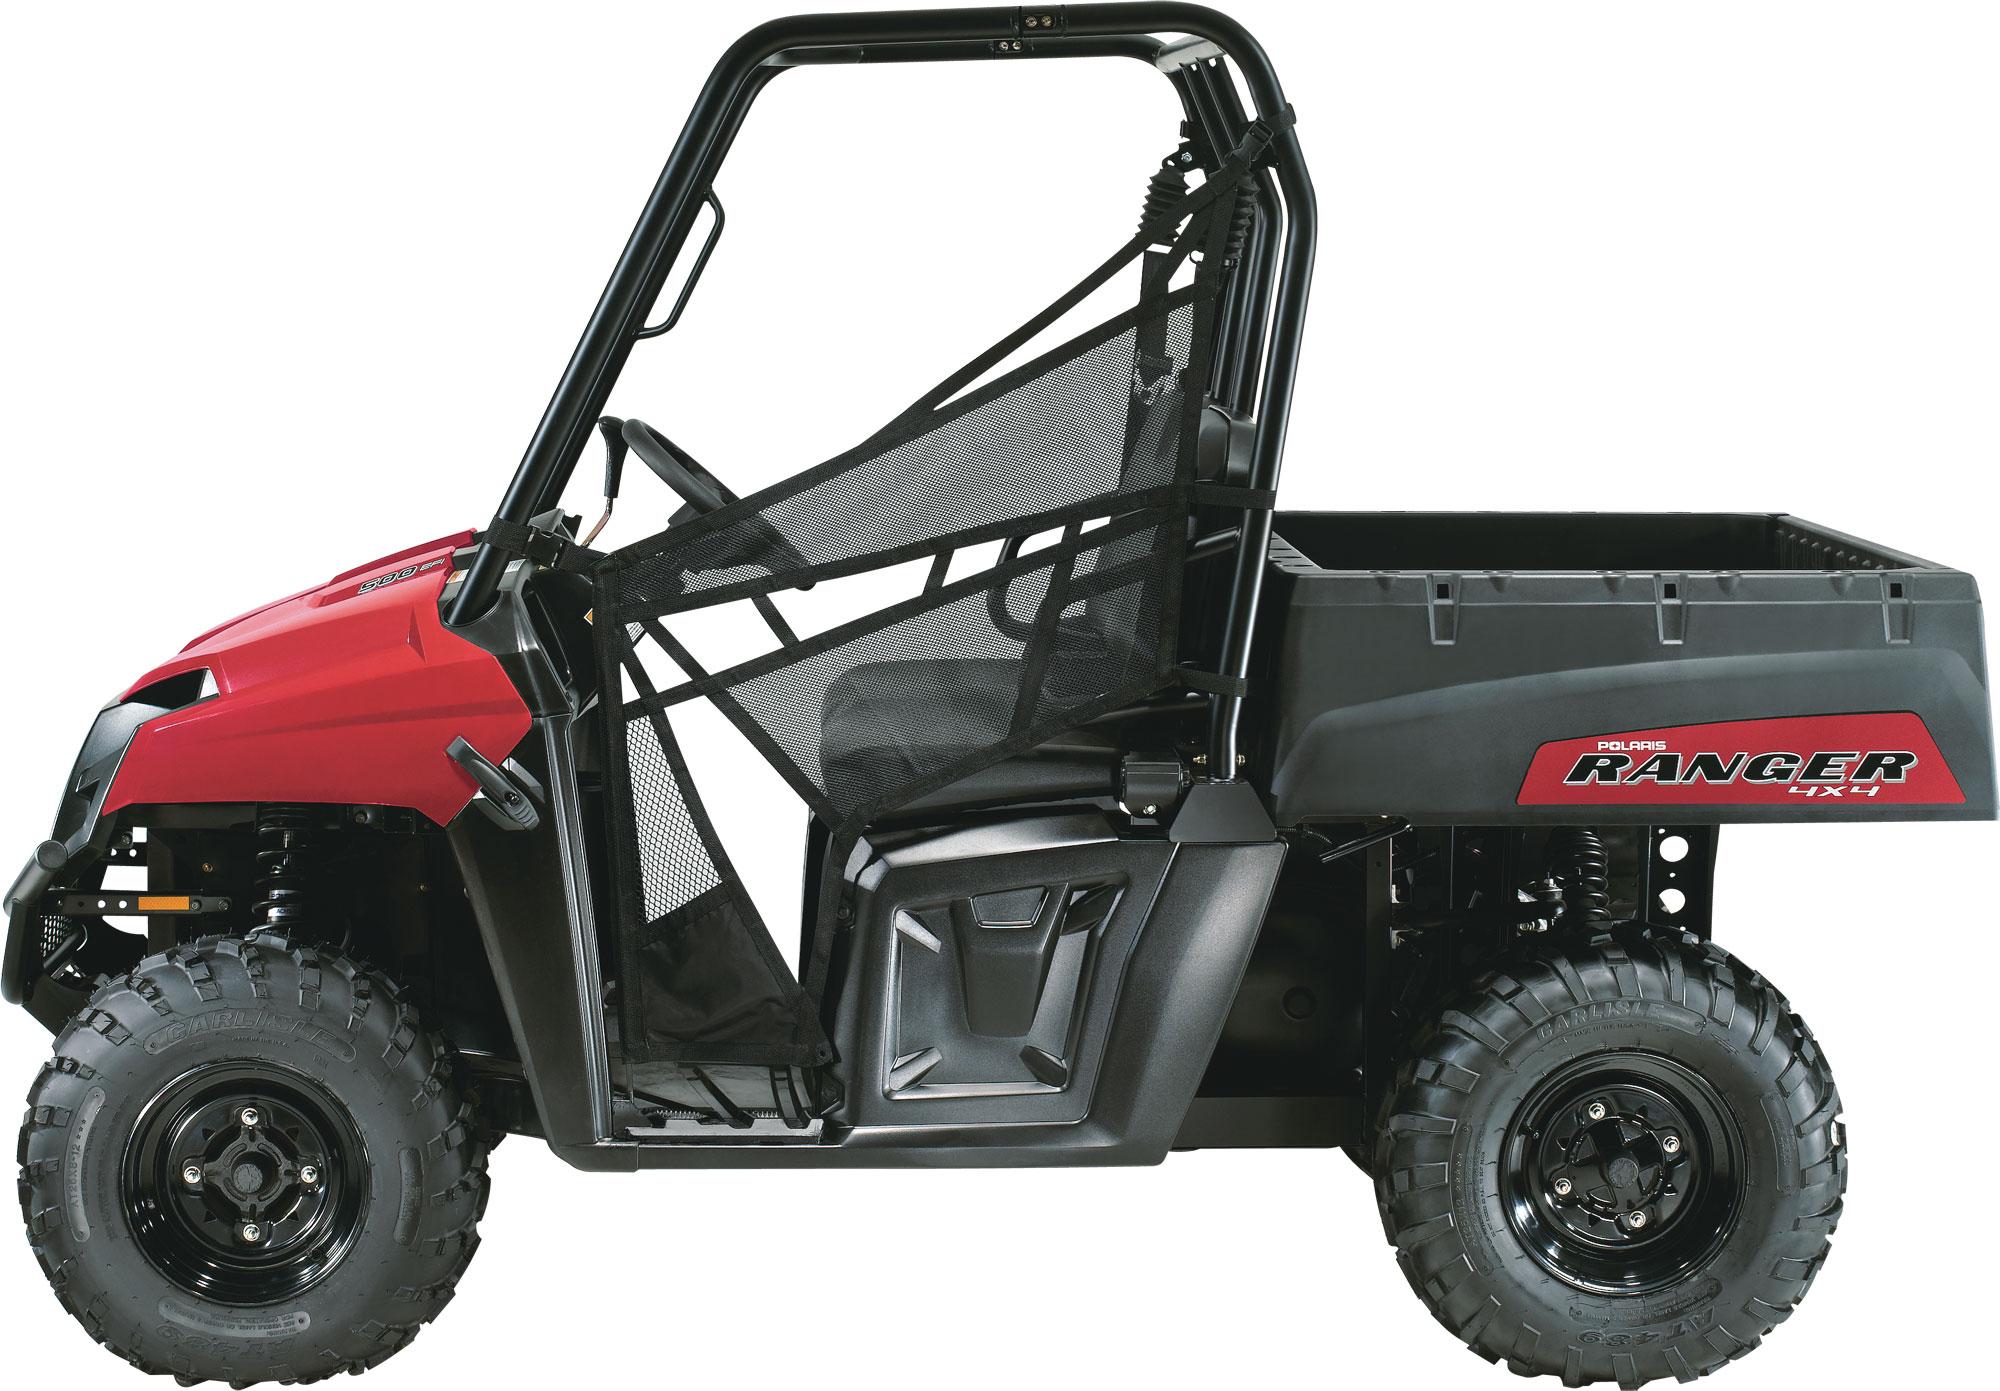 POLARIS Ranger 500 EFI specs - 2011, 2012 - autoevolution